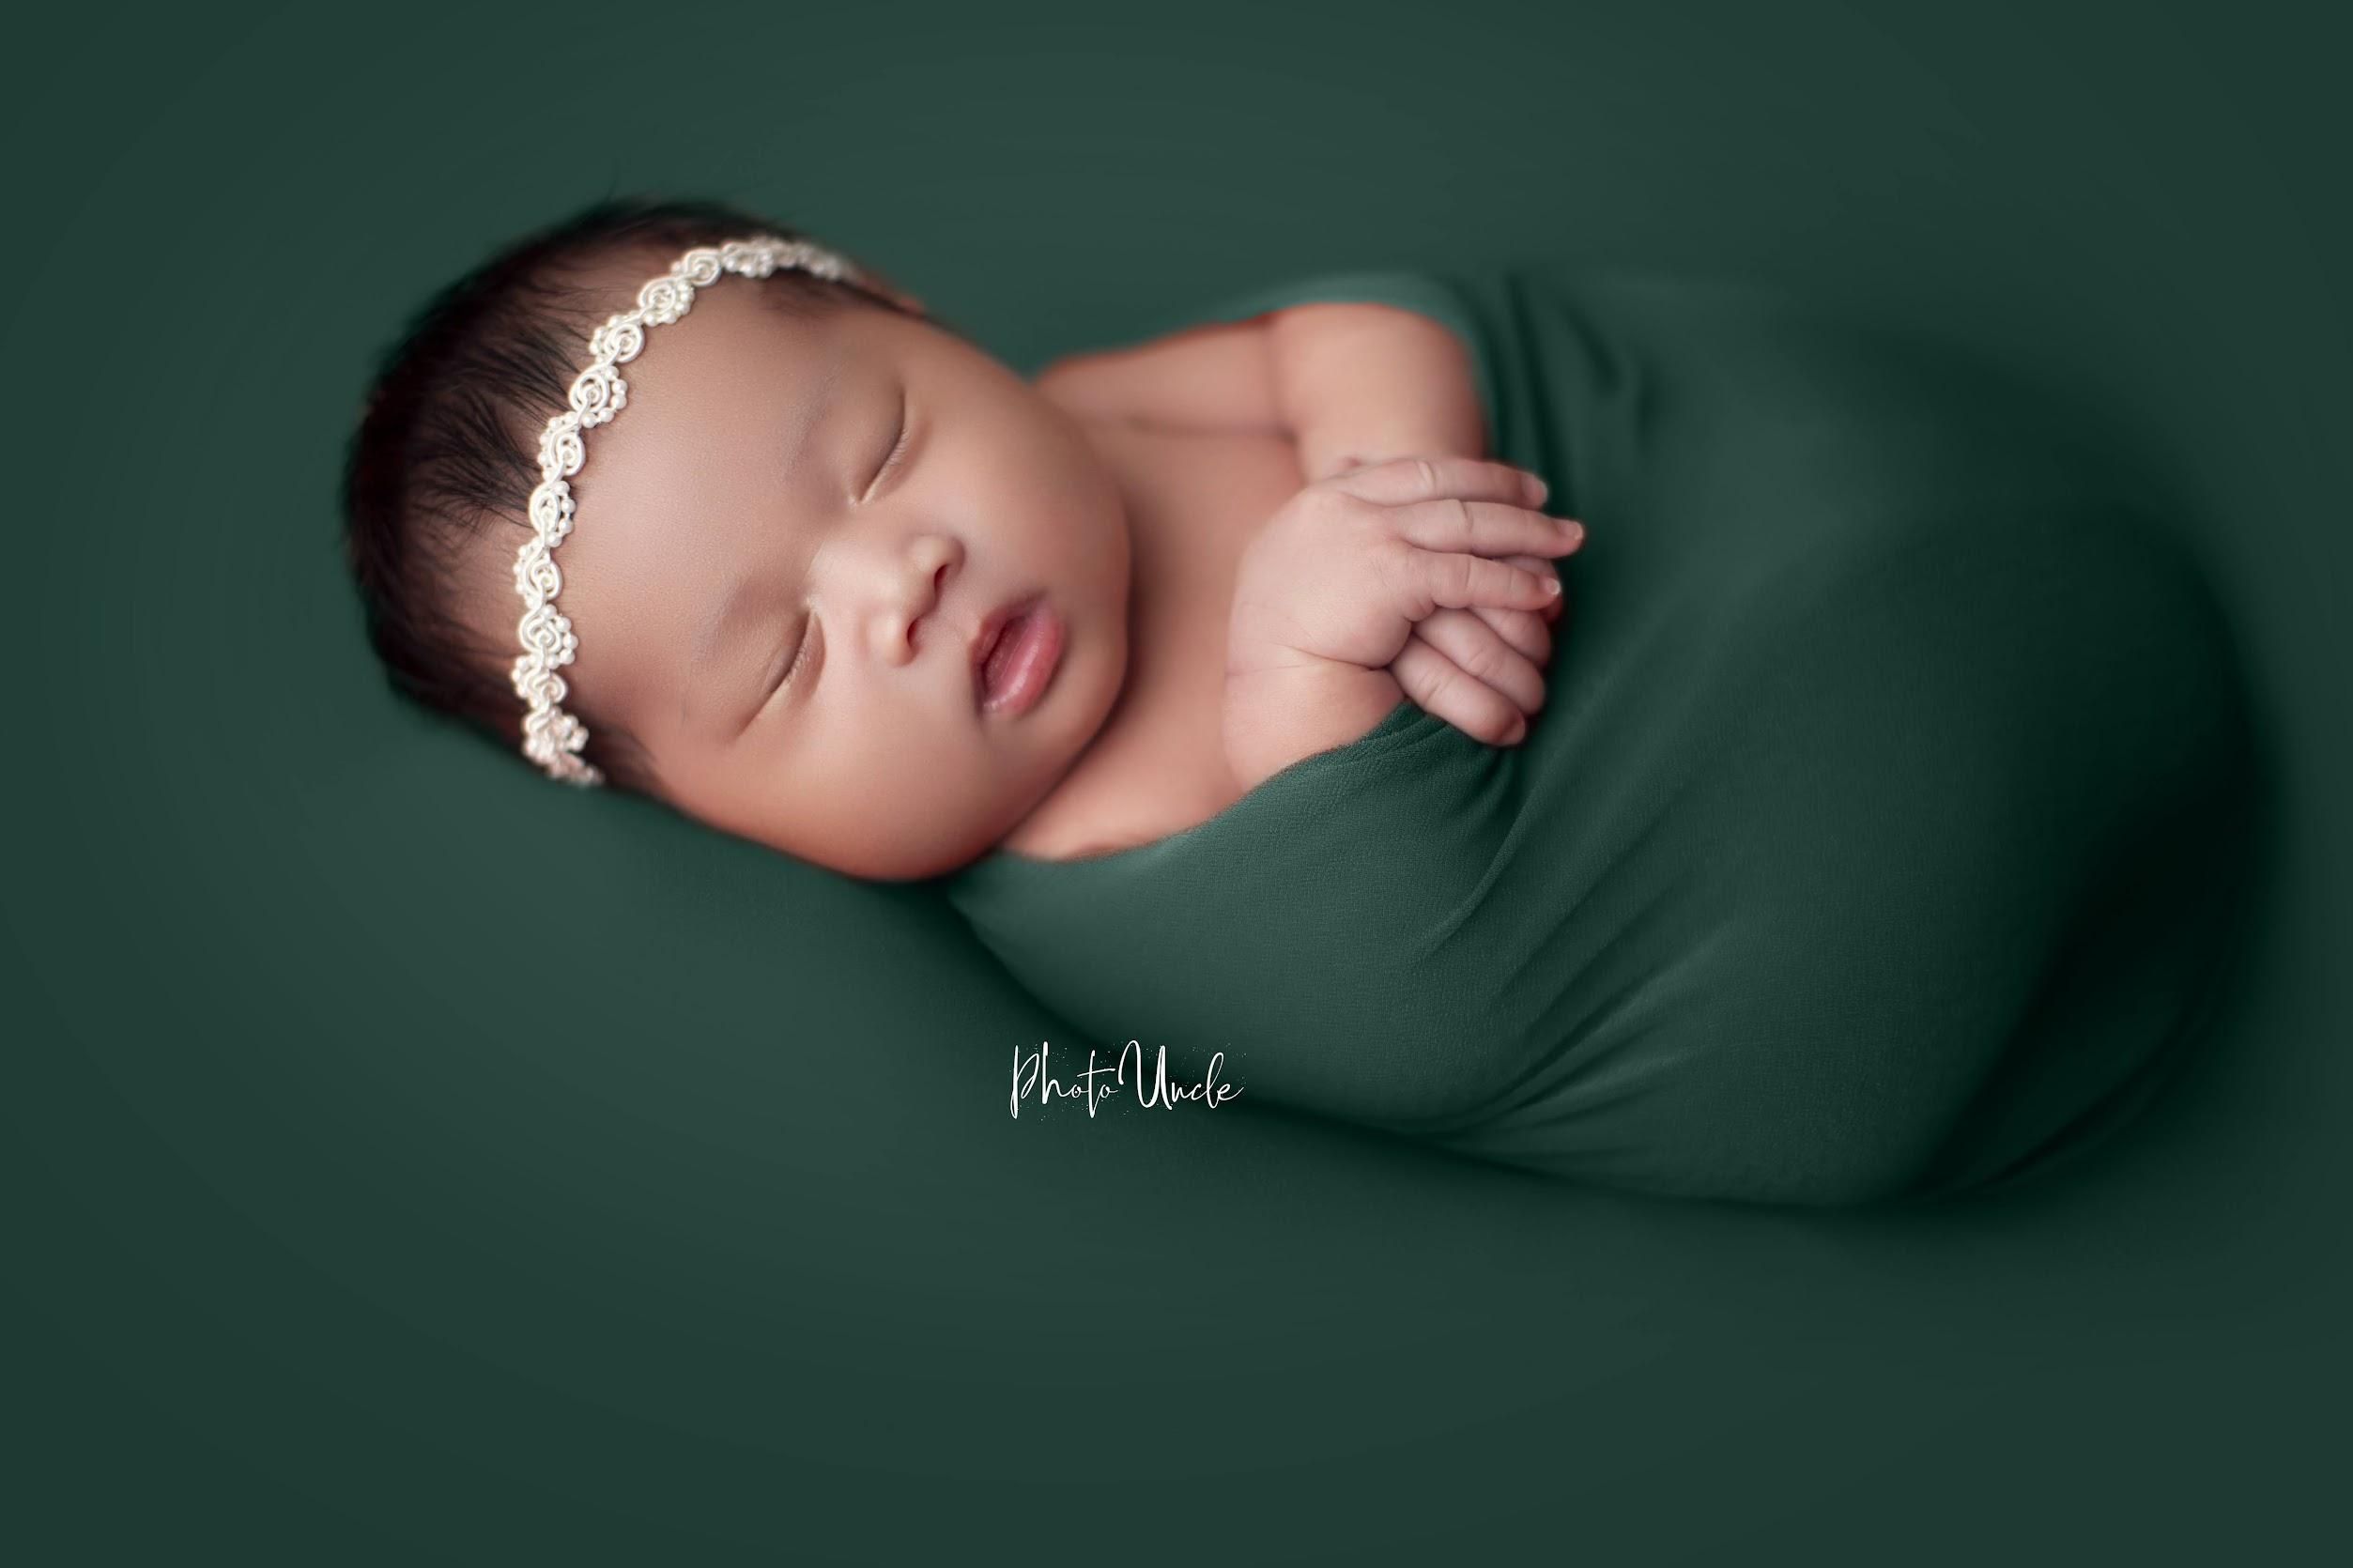 Newborn Photography - image on https://photouncle.com